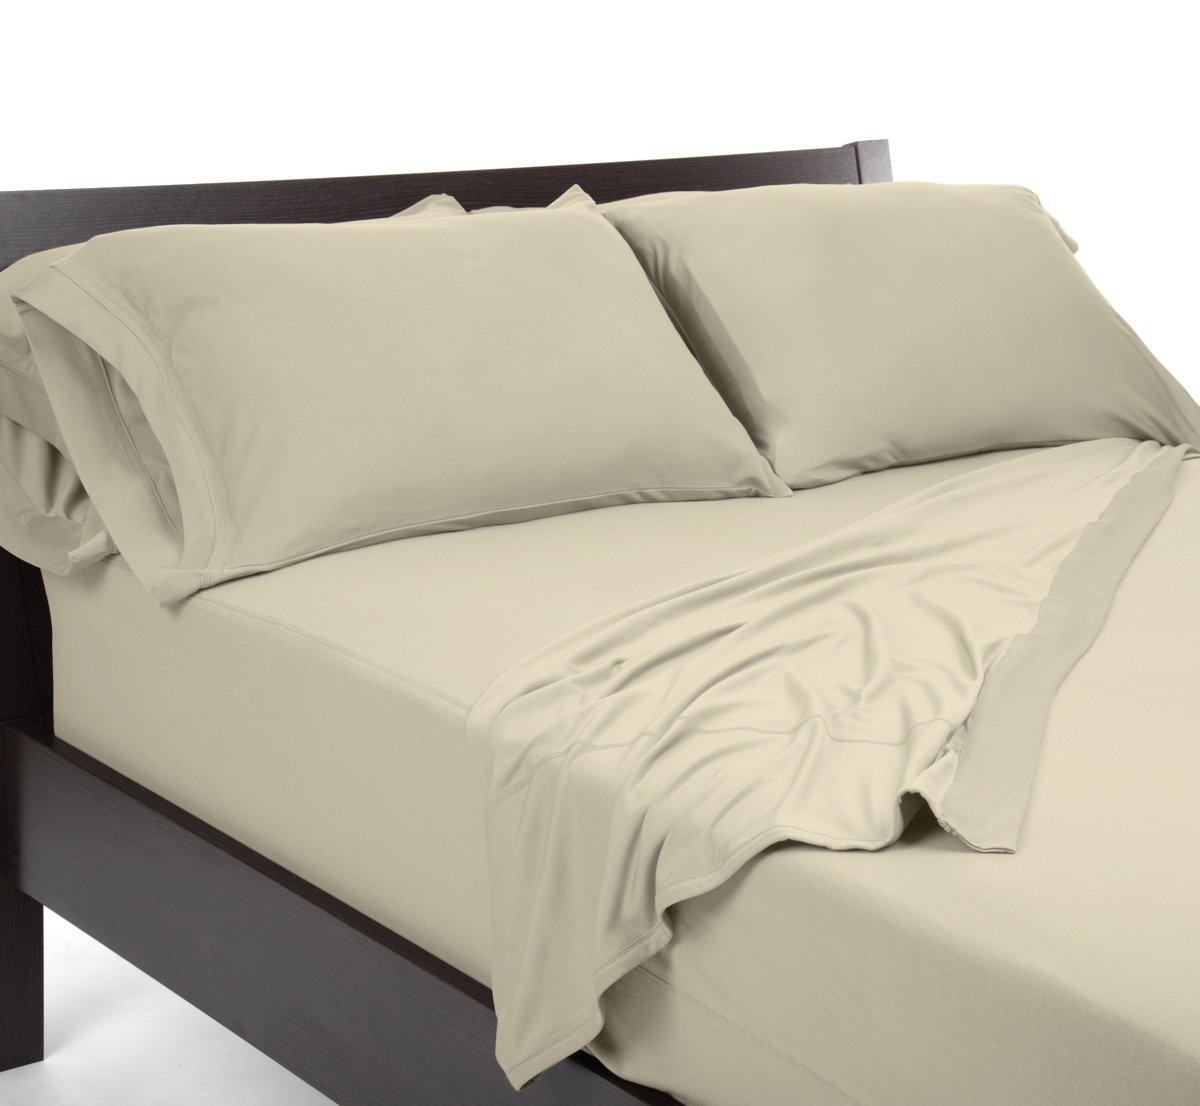 SHEEX REVERSIBLE Pillowcases - Standard Sand